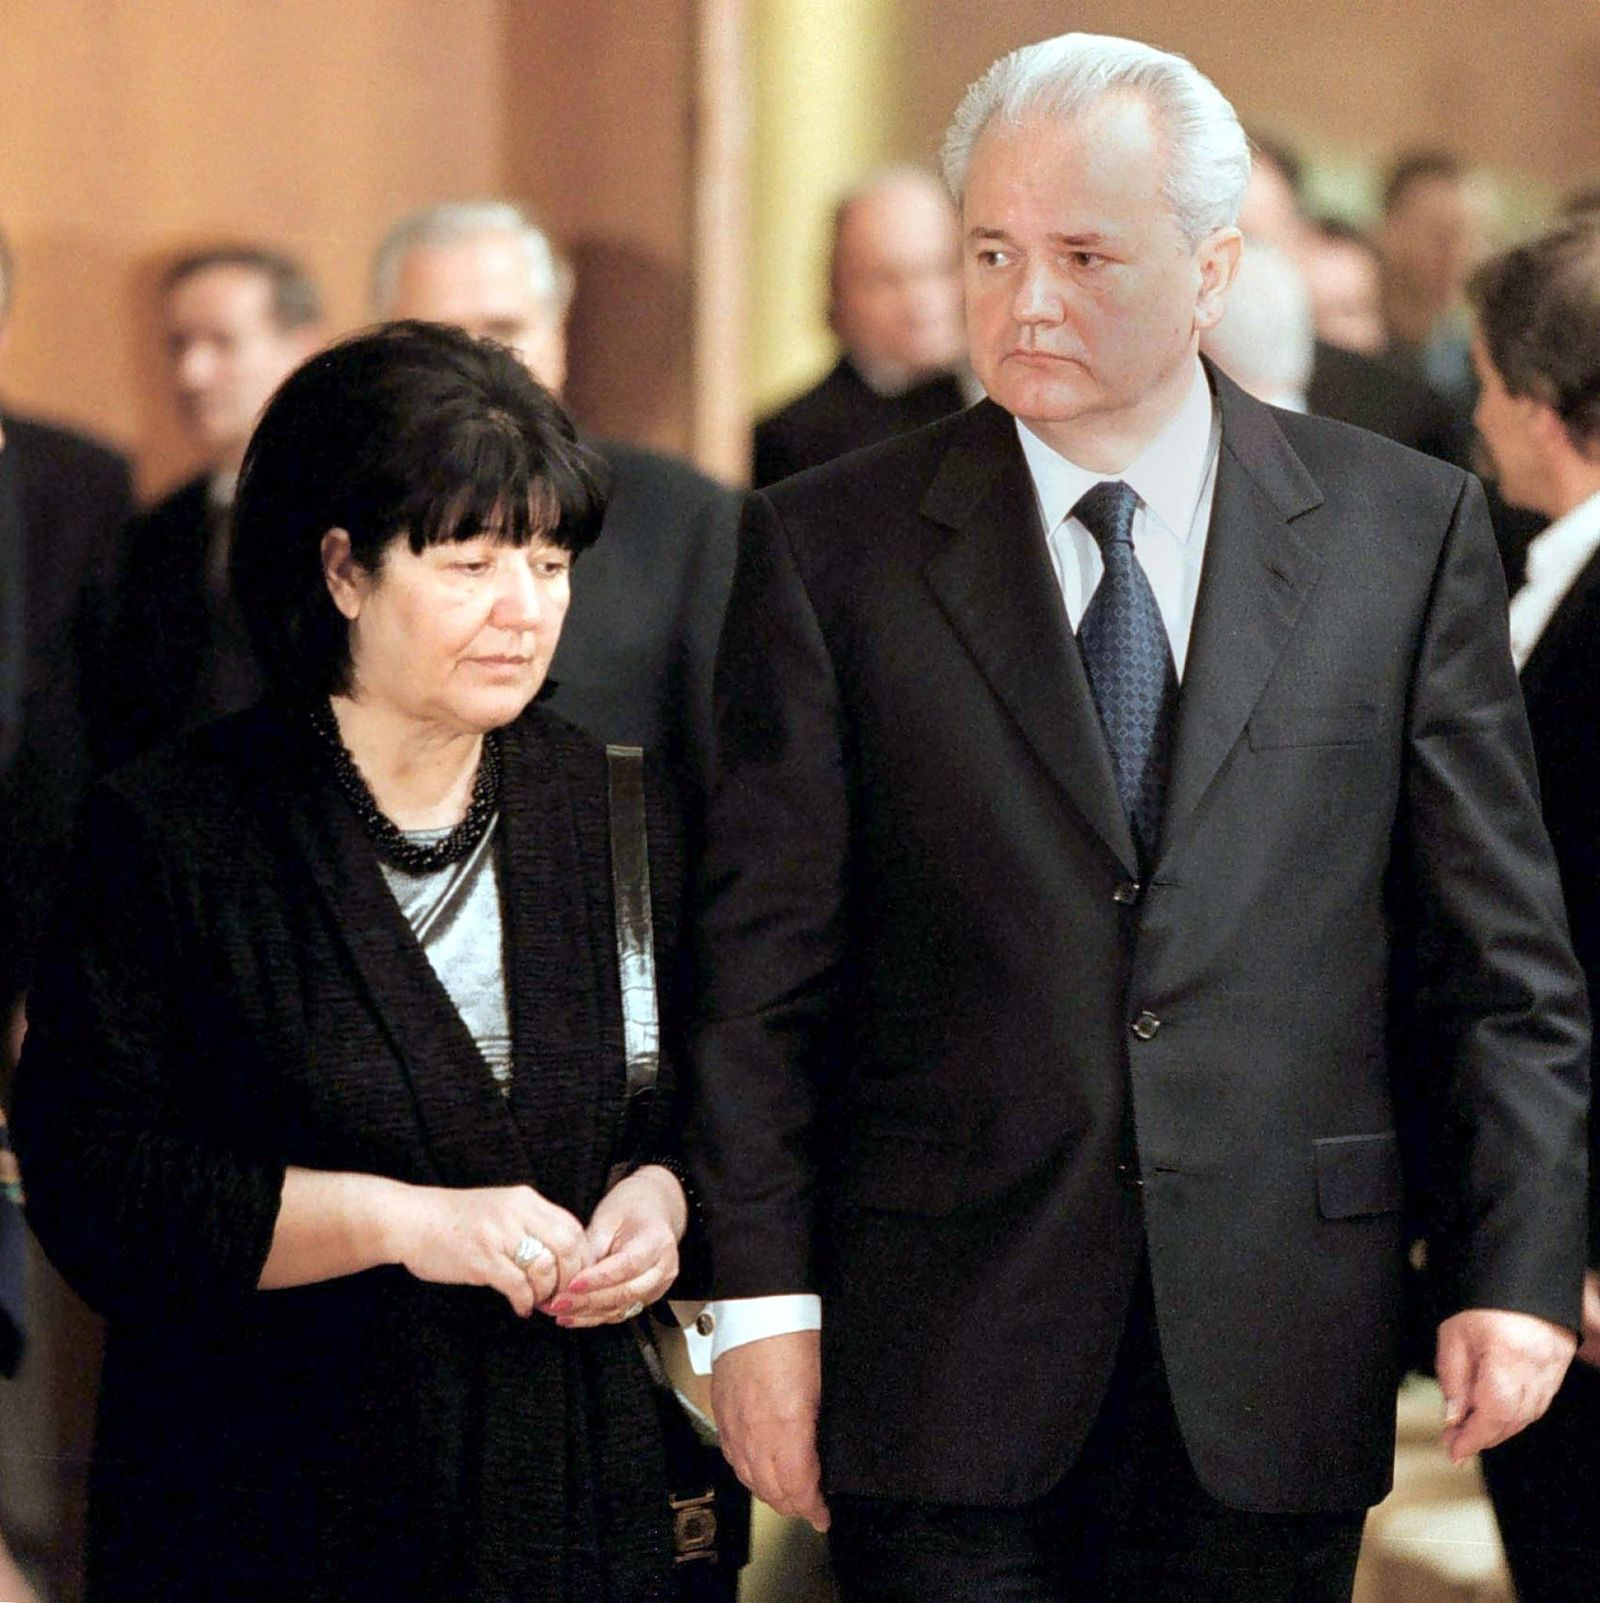 HOLDHOLDHOLD Slobodan Milosevic und Mirjana Markovic